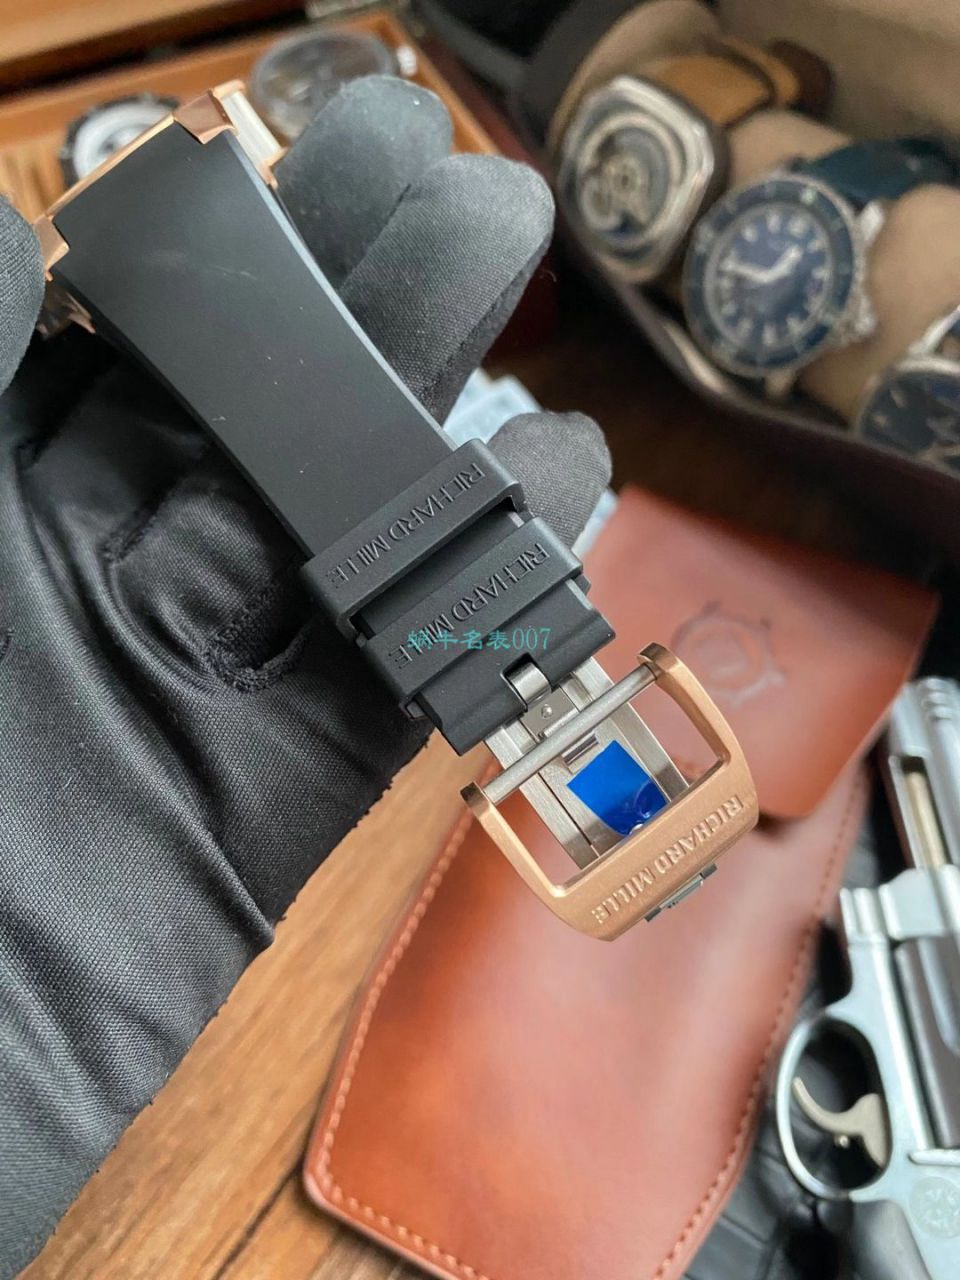 V9理查德米勒Richard Mille RM 63-01一比一顶级精仿手表 Dizzy Hands男装自动机械腕表 / RM 63-01V9